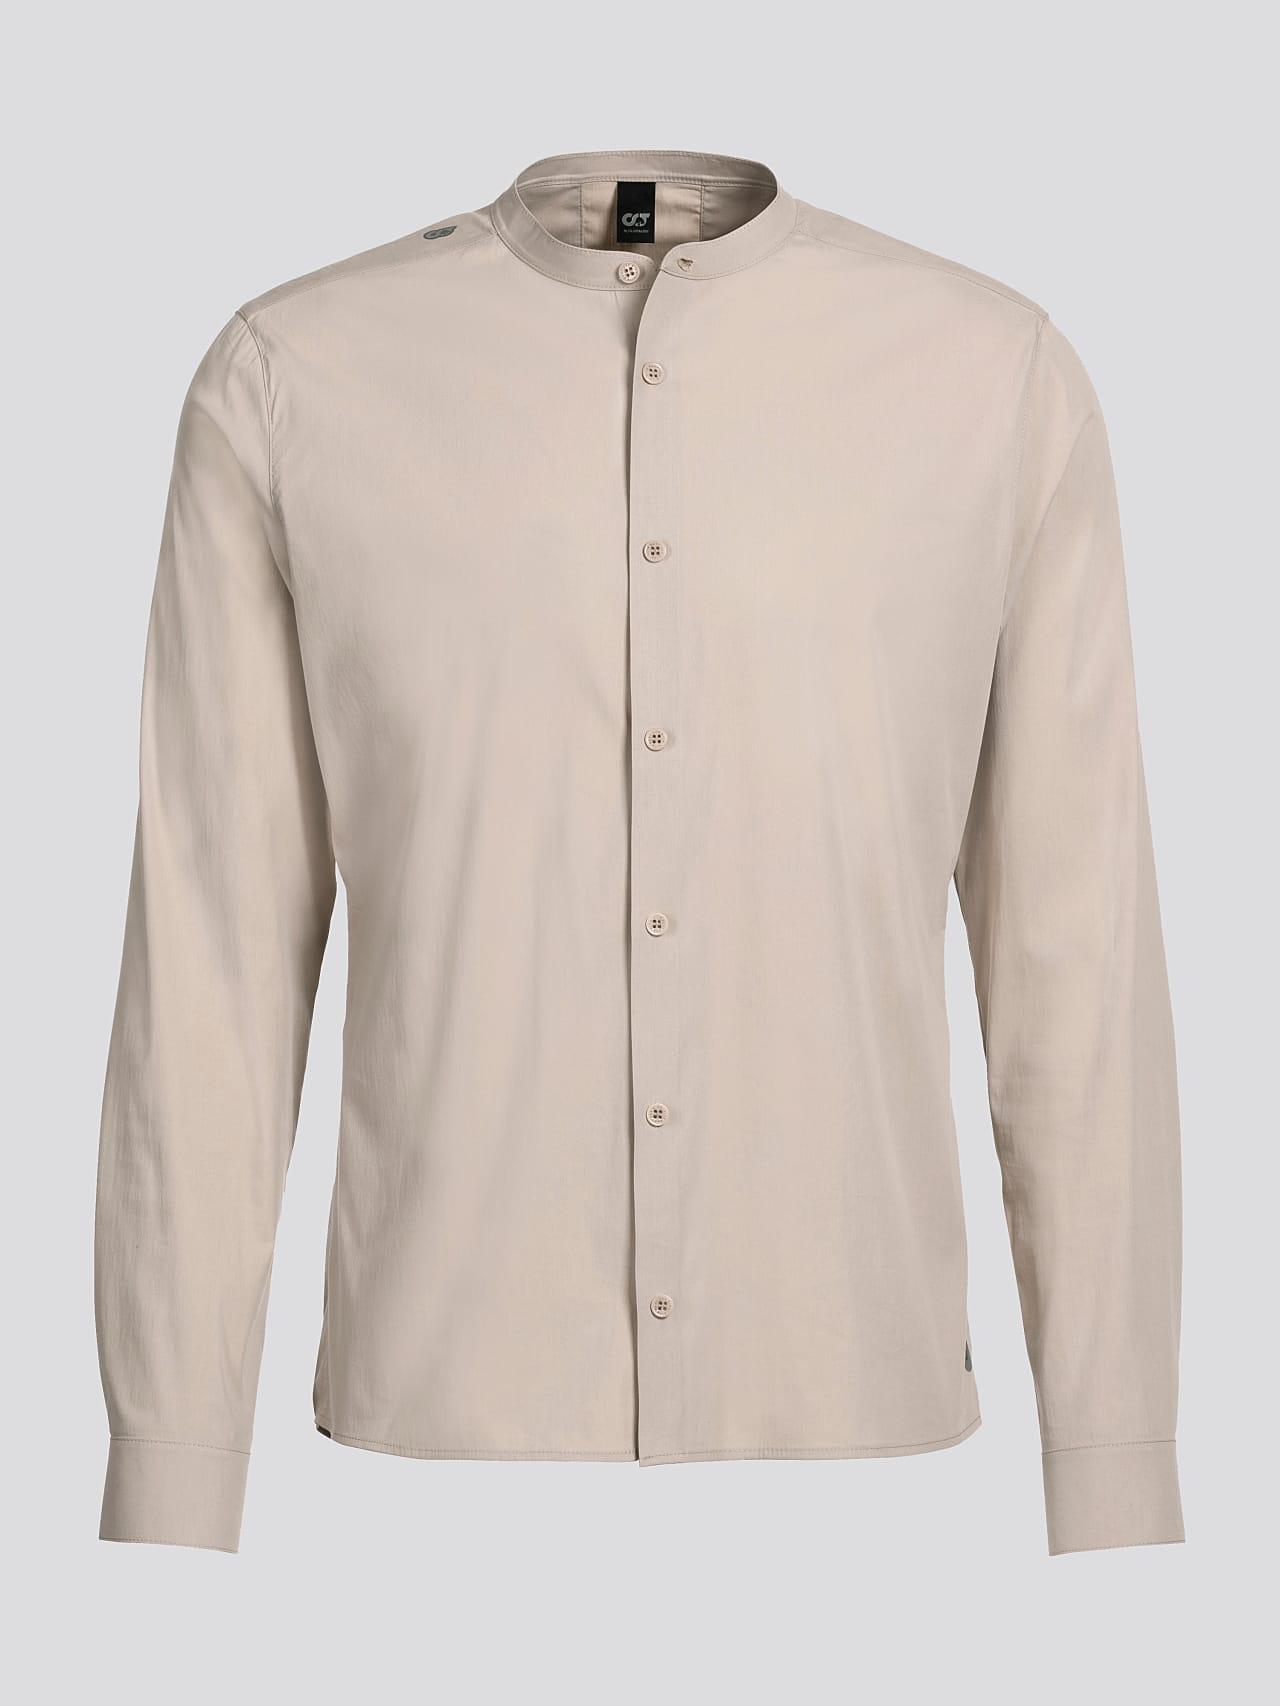 WIDT V9.Y5.01 Stand-Up Collar Cotton-Stretch Shirt Sand Back Alpha Tauri